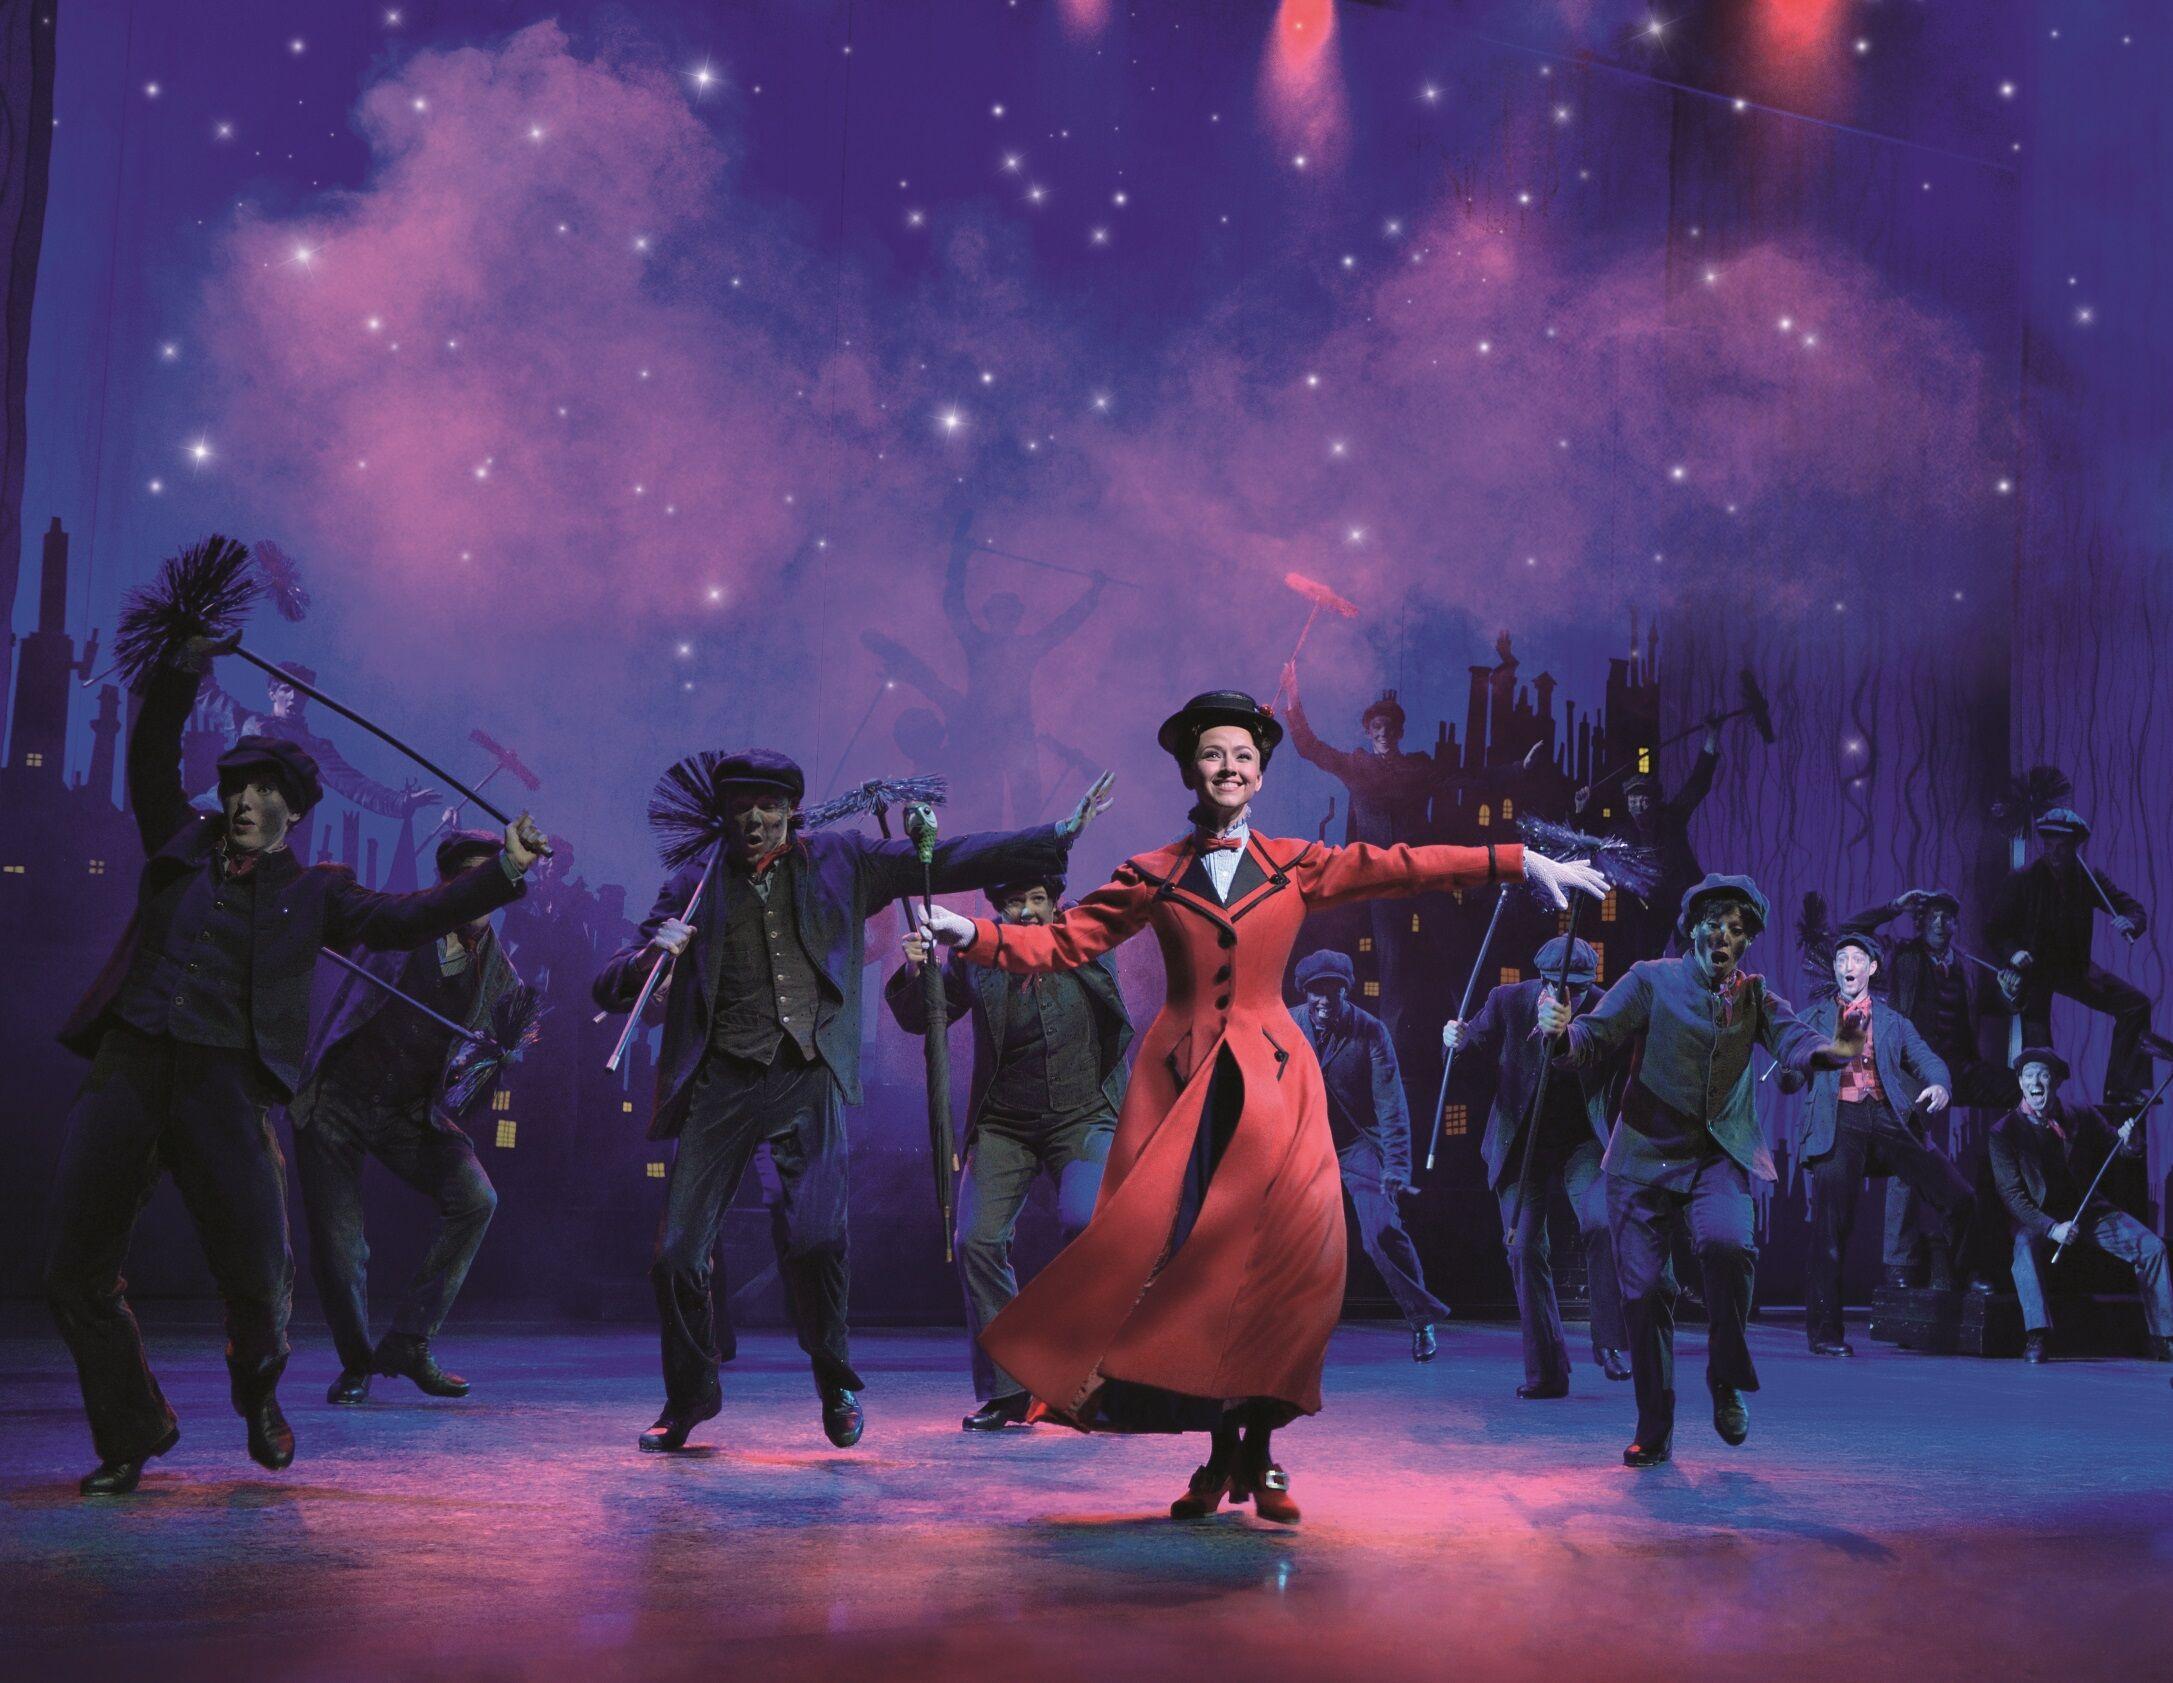 Szenenmotiv aus dem Musical Mary Poppins